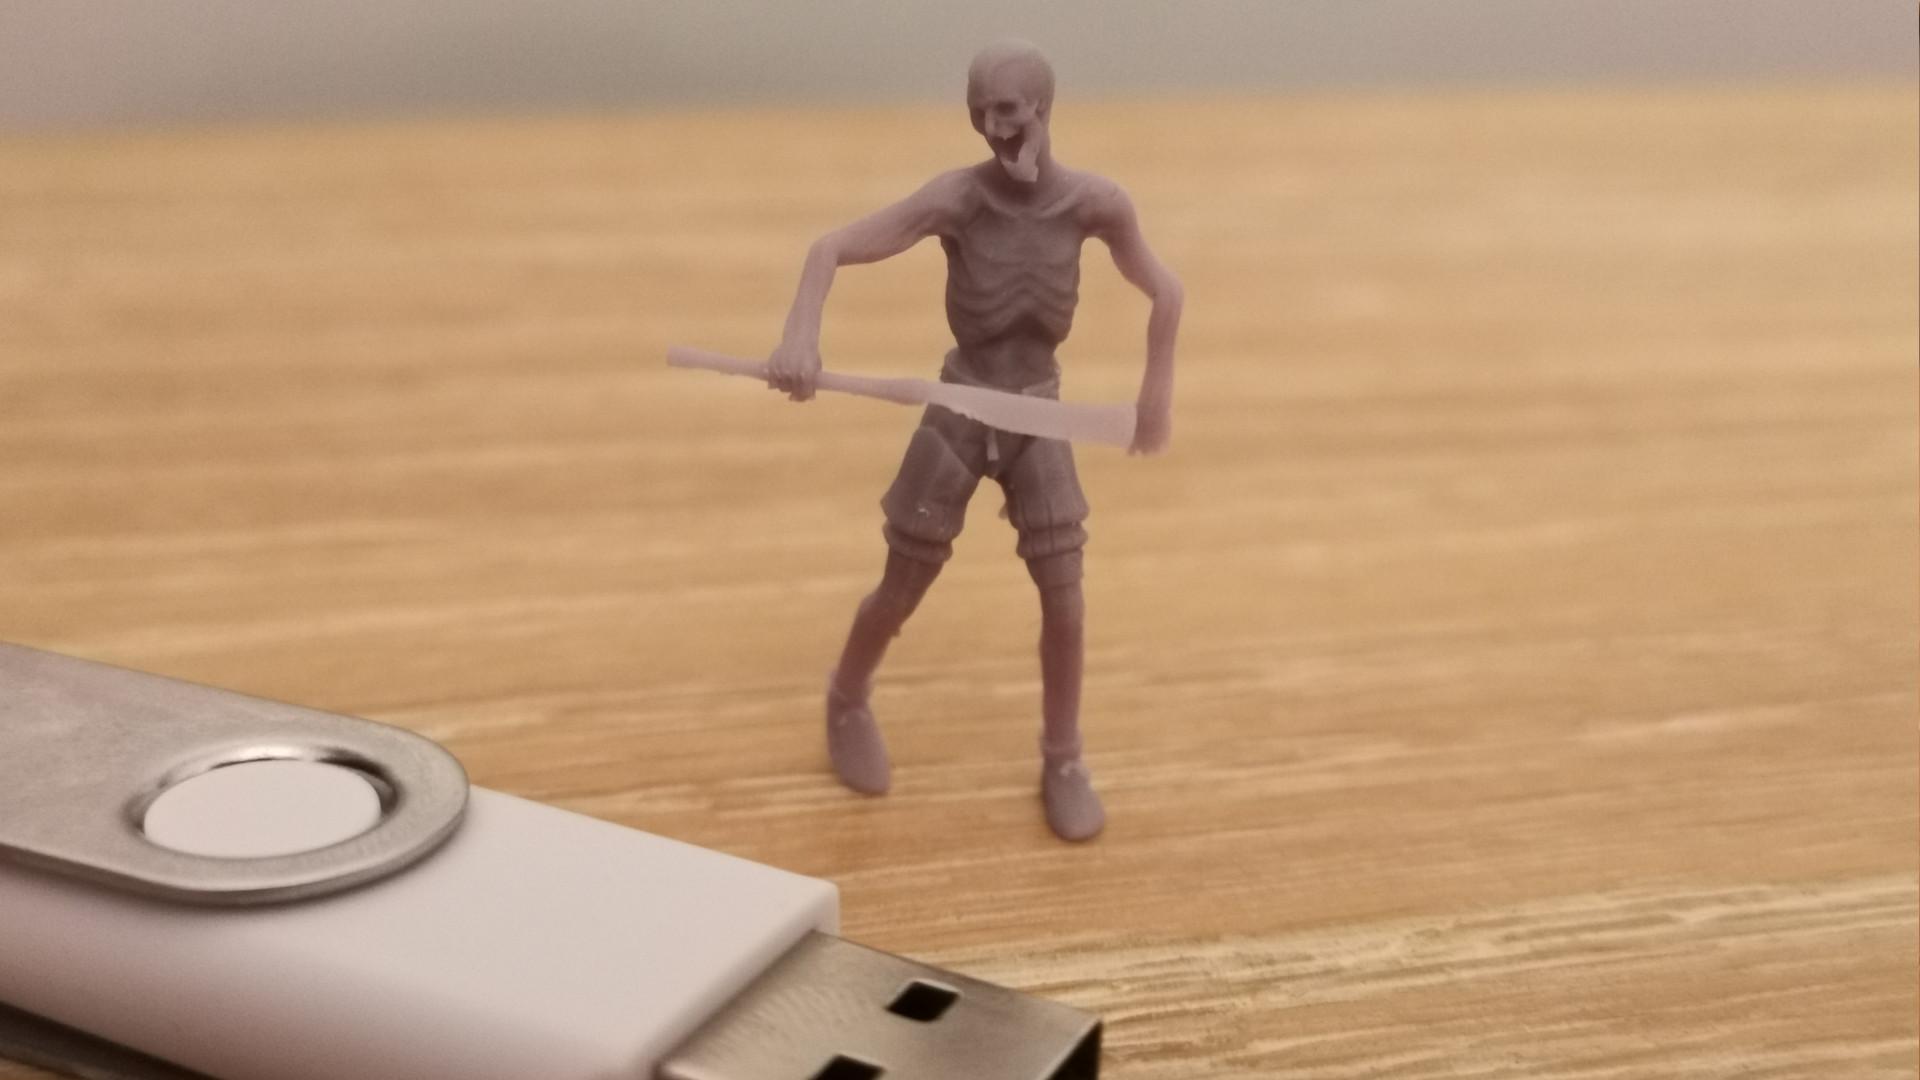 A zombie villager printed on the Elegoo Mars 2 Pro